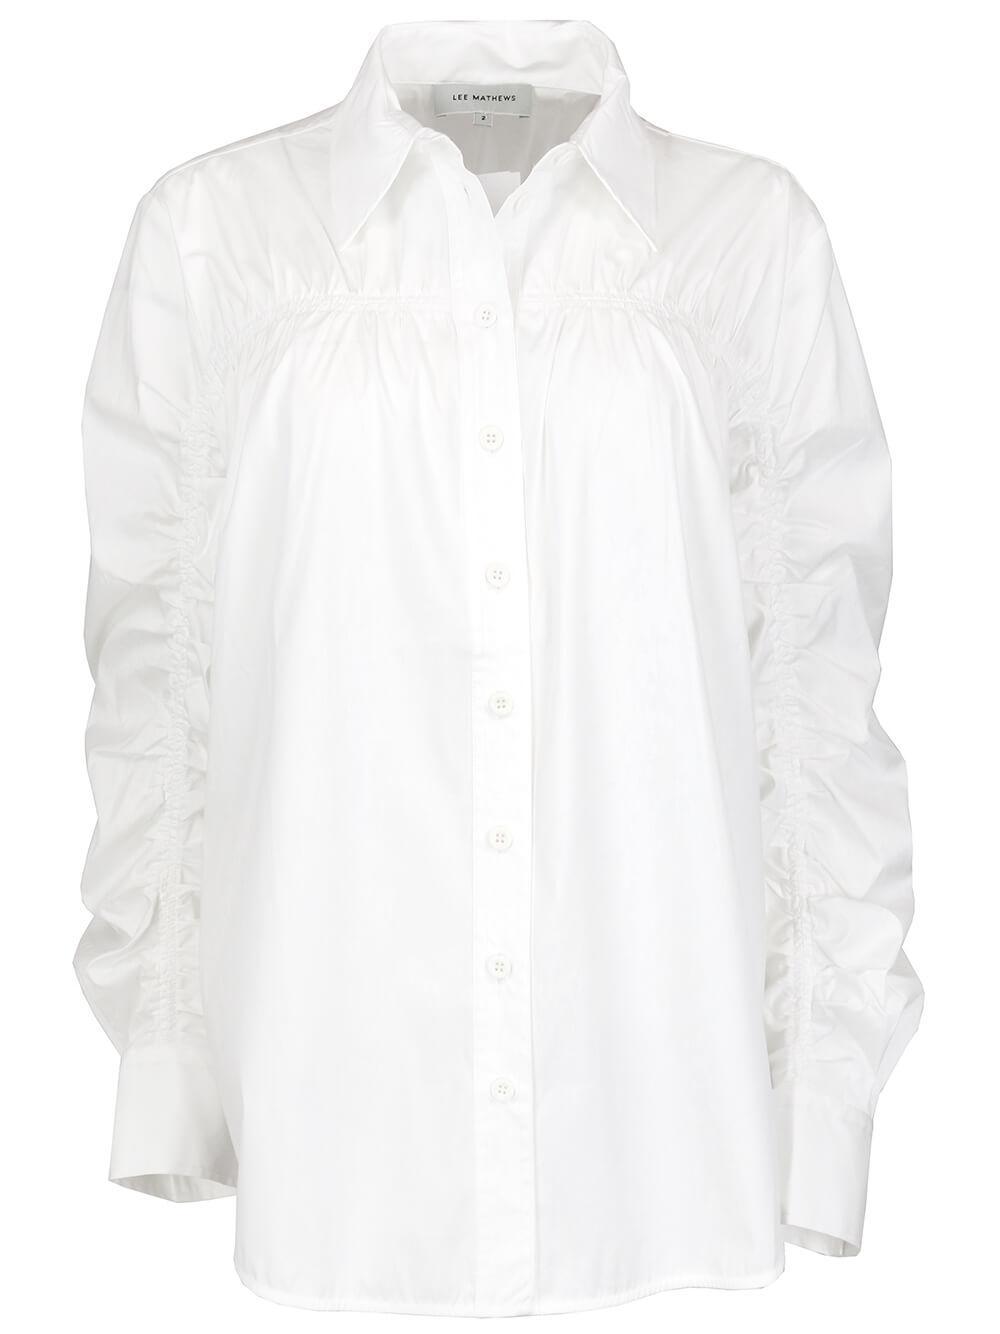 Victoria Gathered Shirt Item # M2101TO188